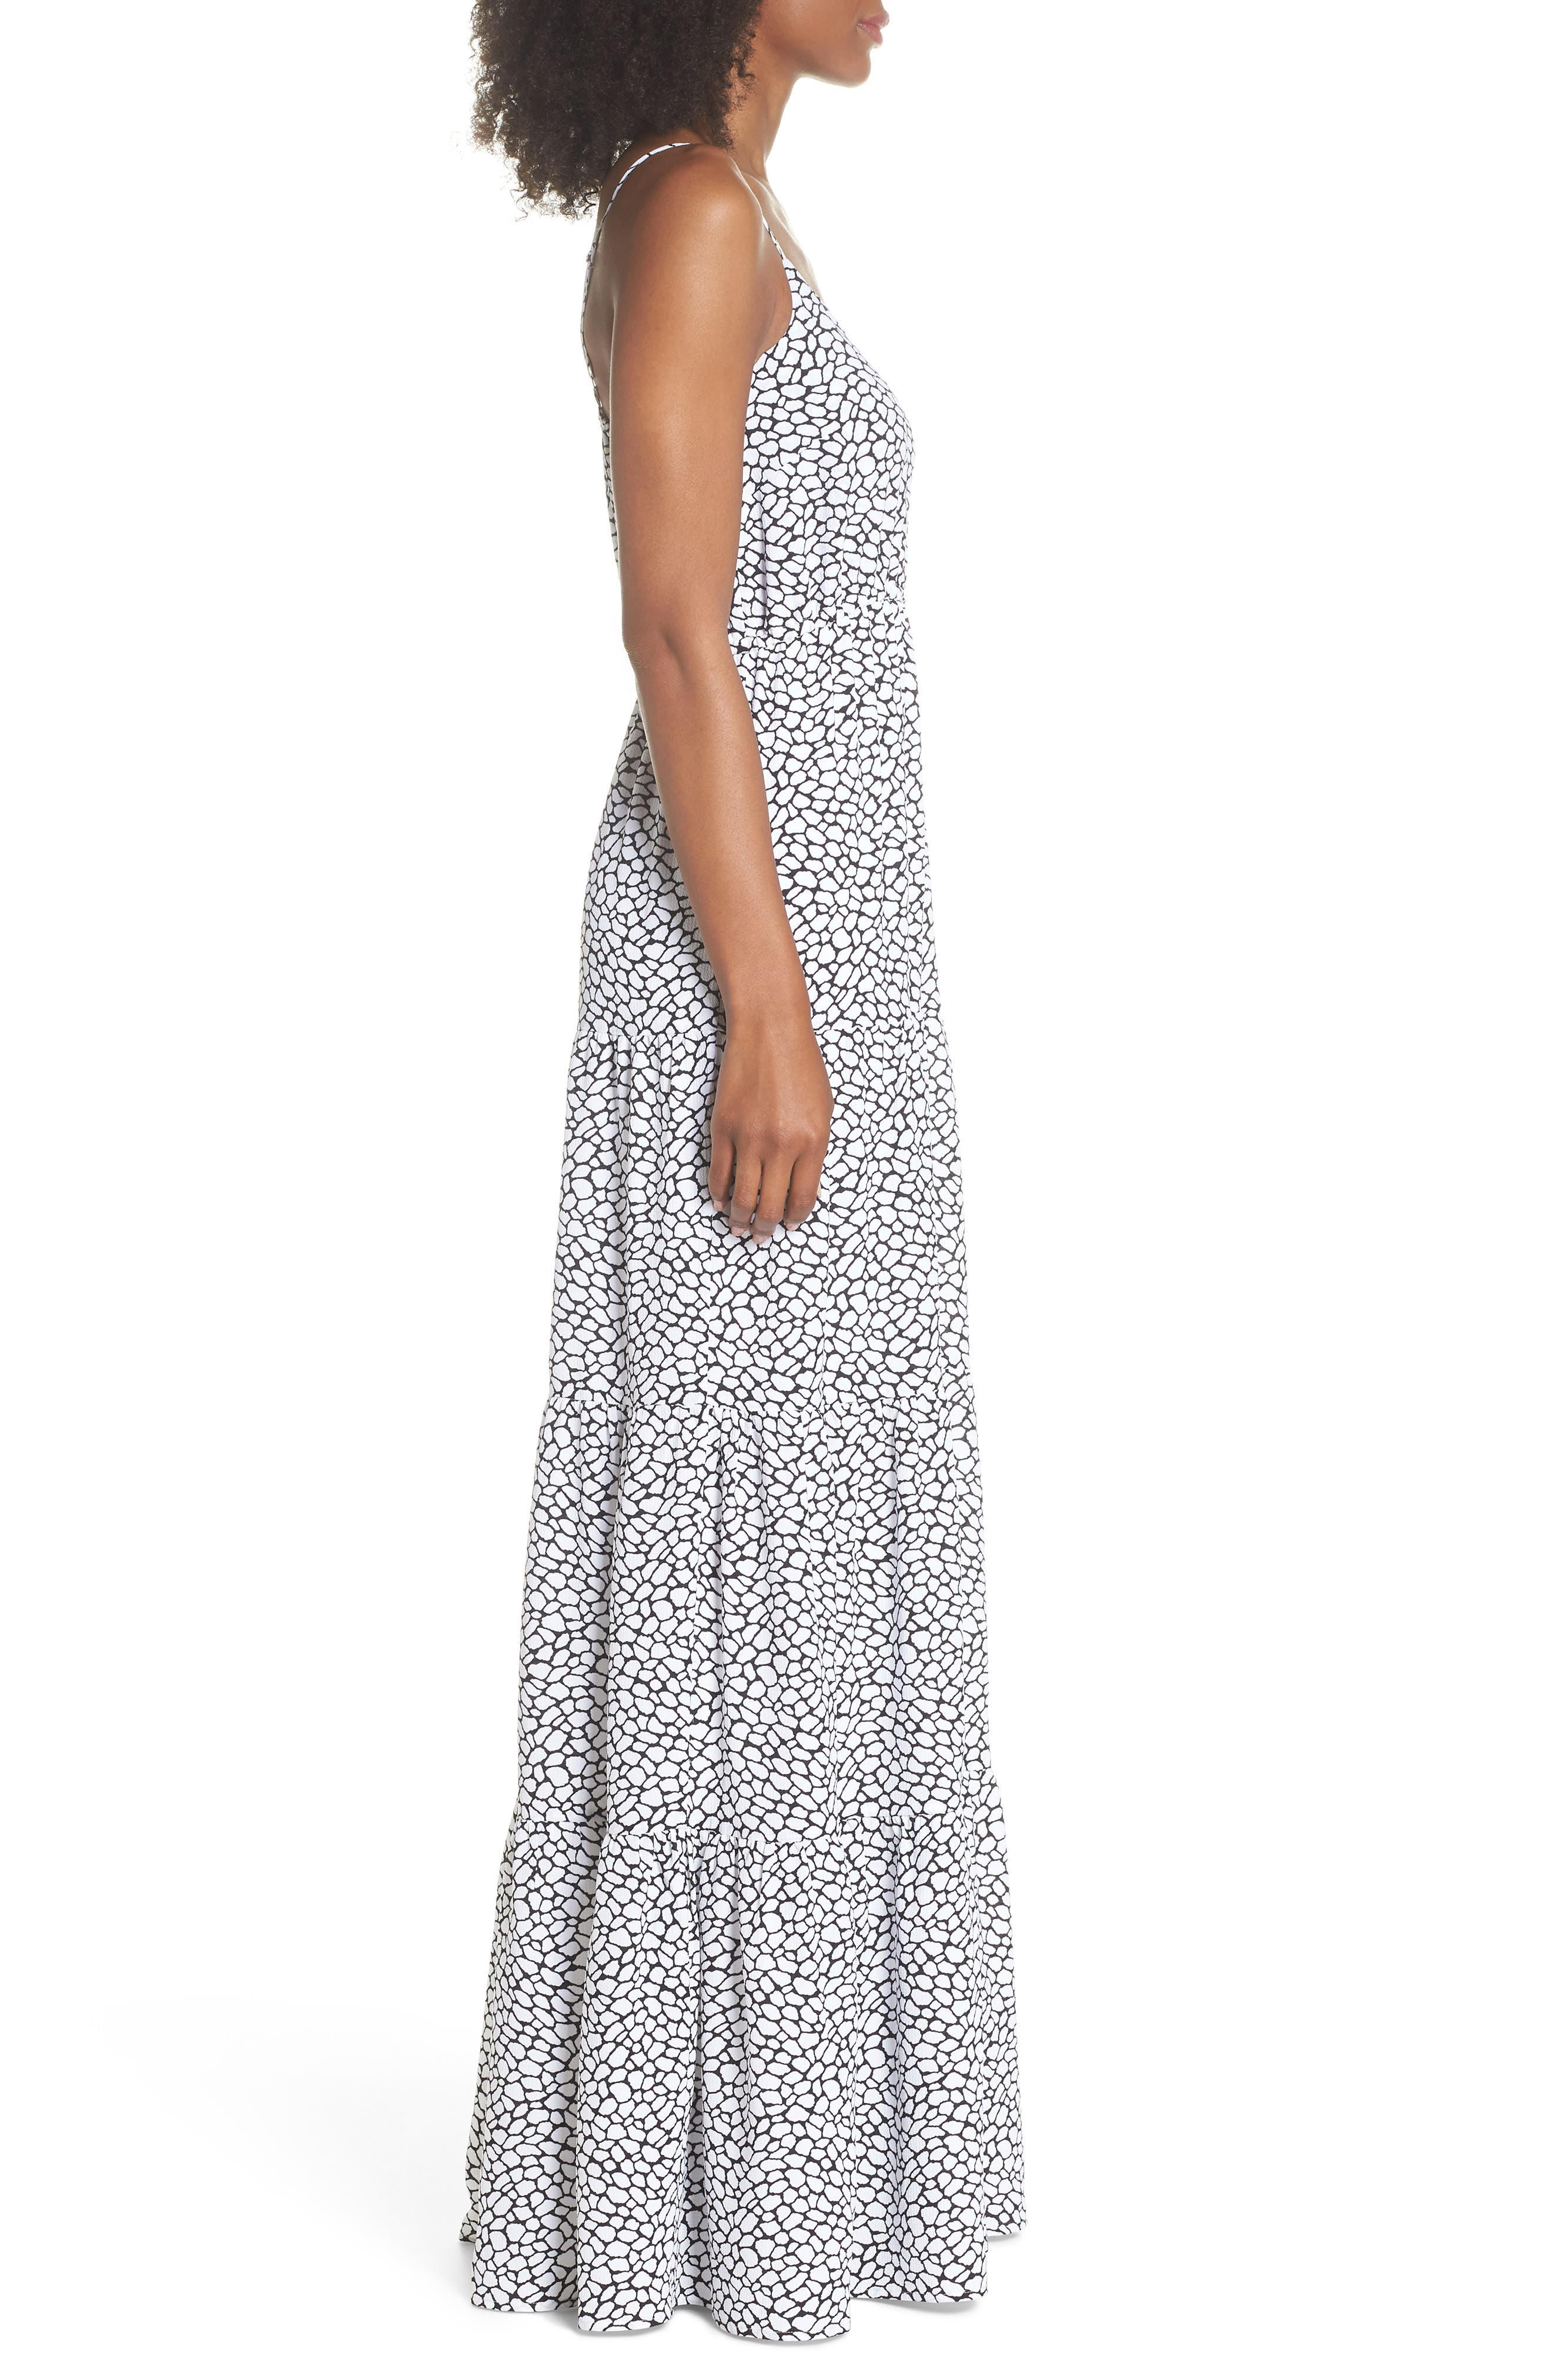 Tiered Maxi Dress,                             Alternate thumbnail 3, color,                             White/ Black